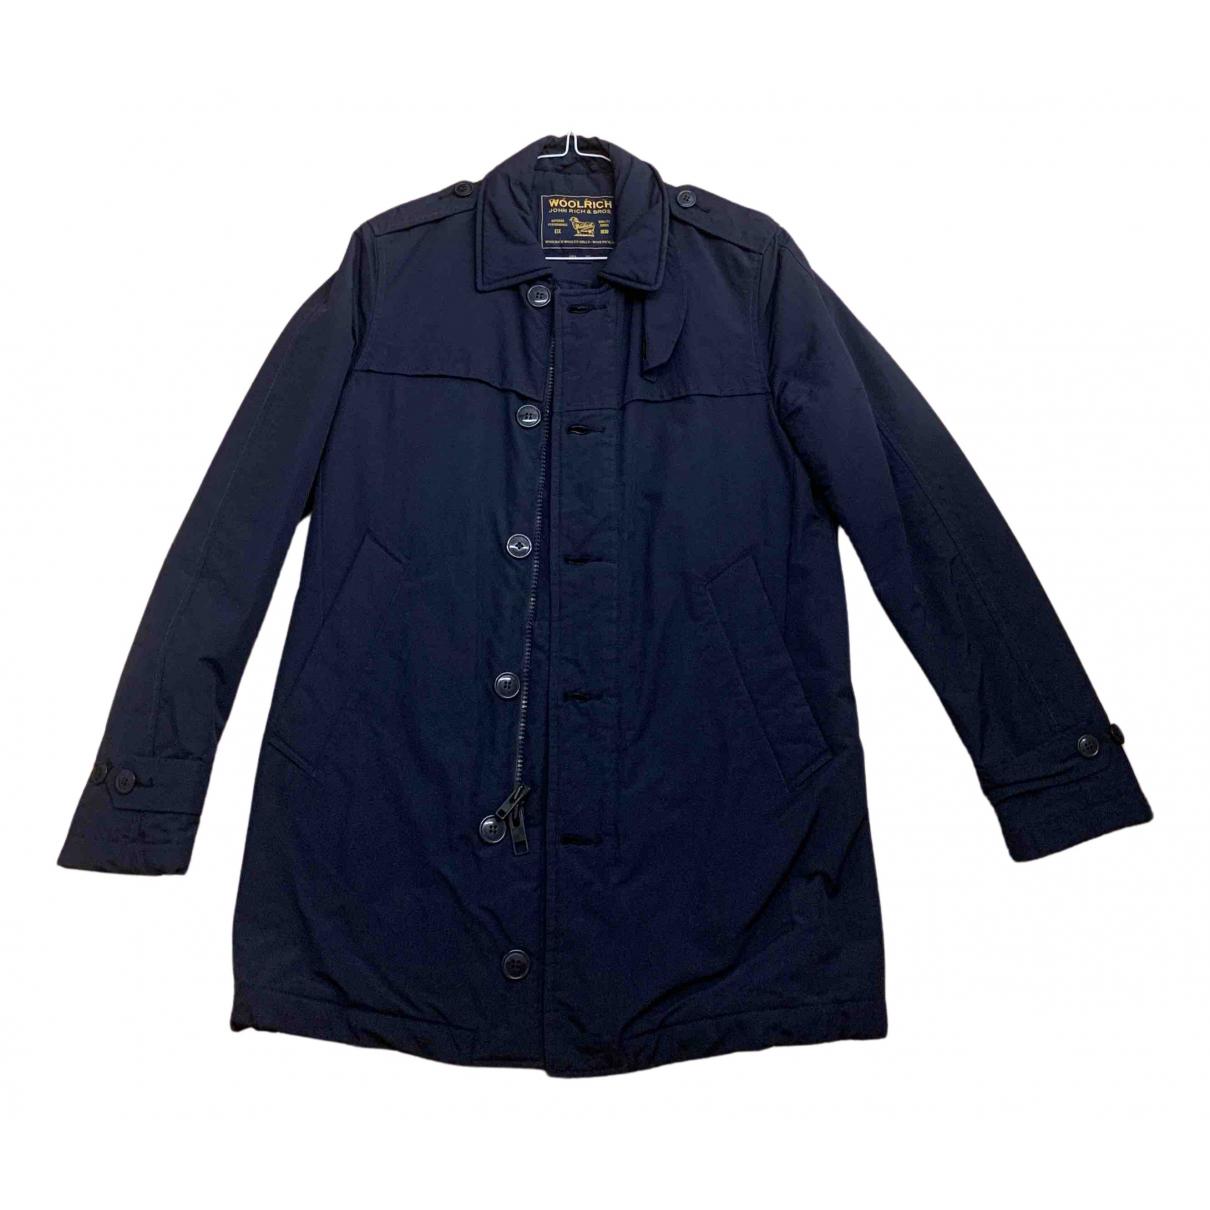 Woolrich \N Jacke in  Blau Polyester